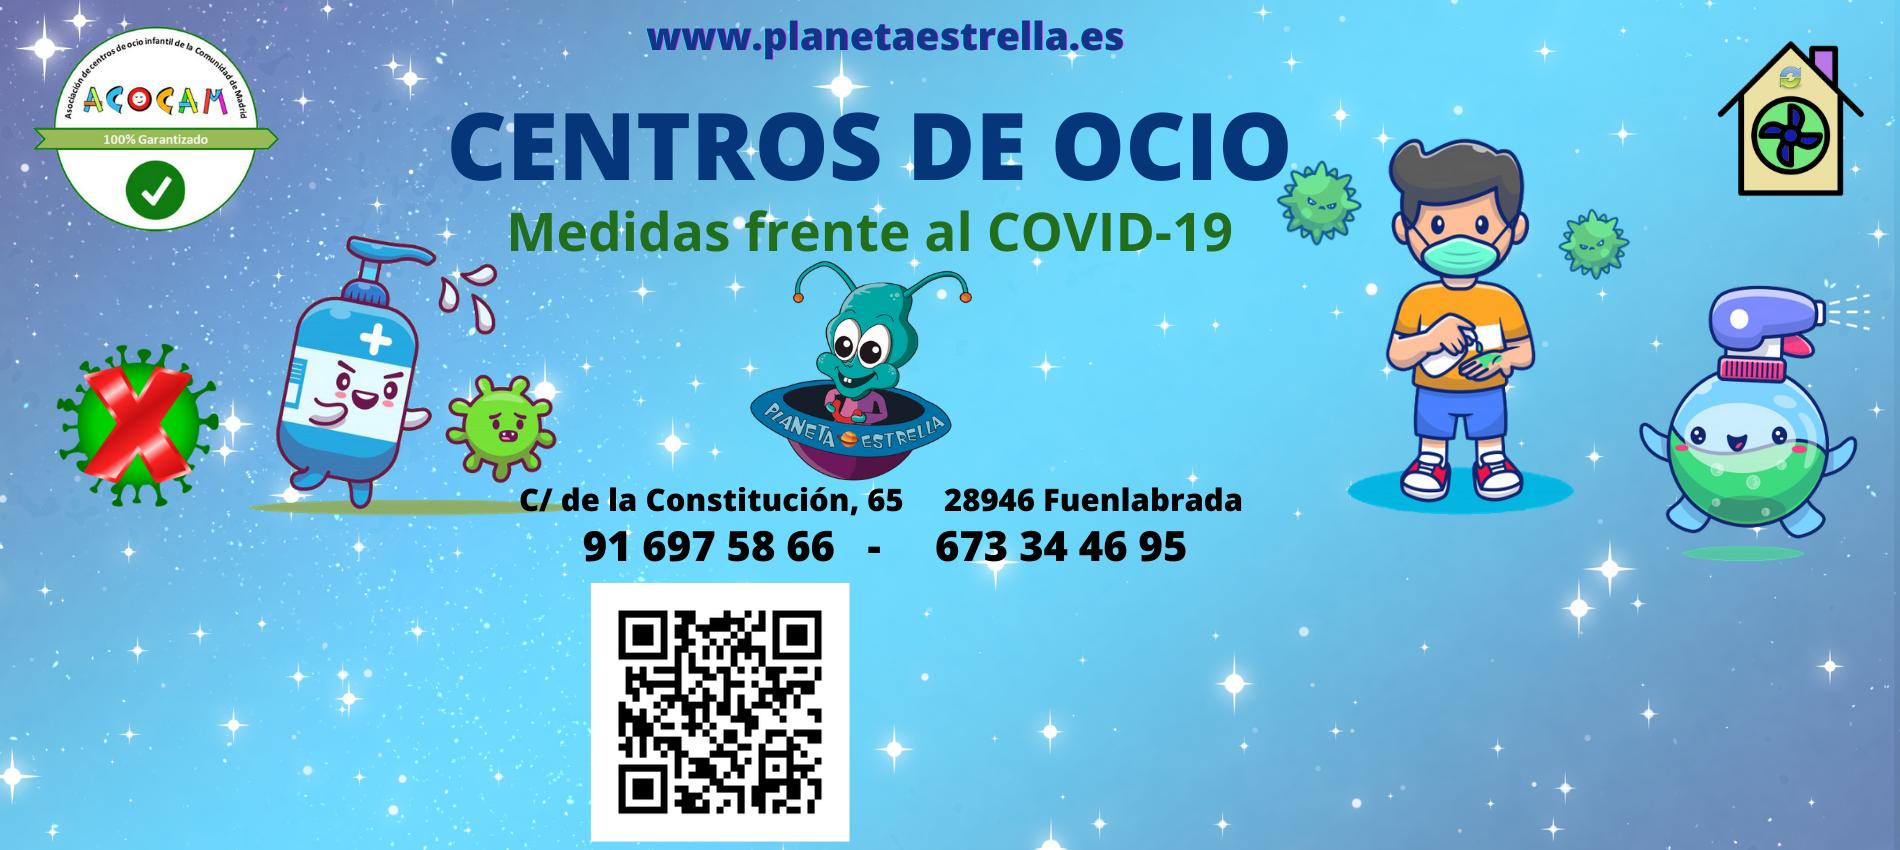 V3-COVID-web-diseno-1900x850-planeta-estrella